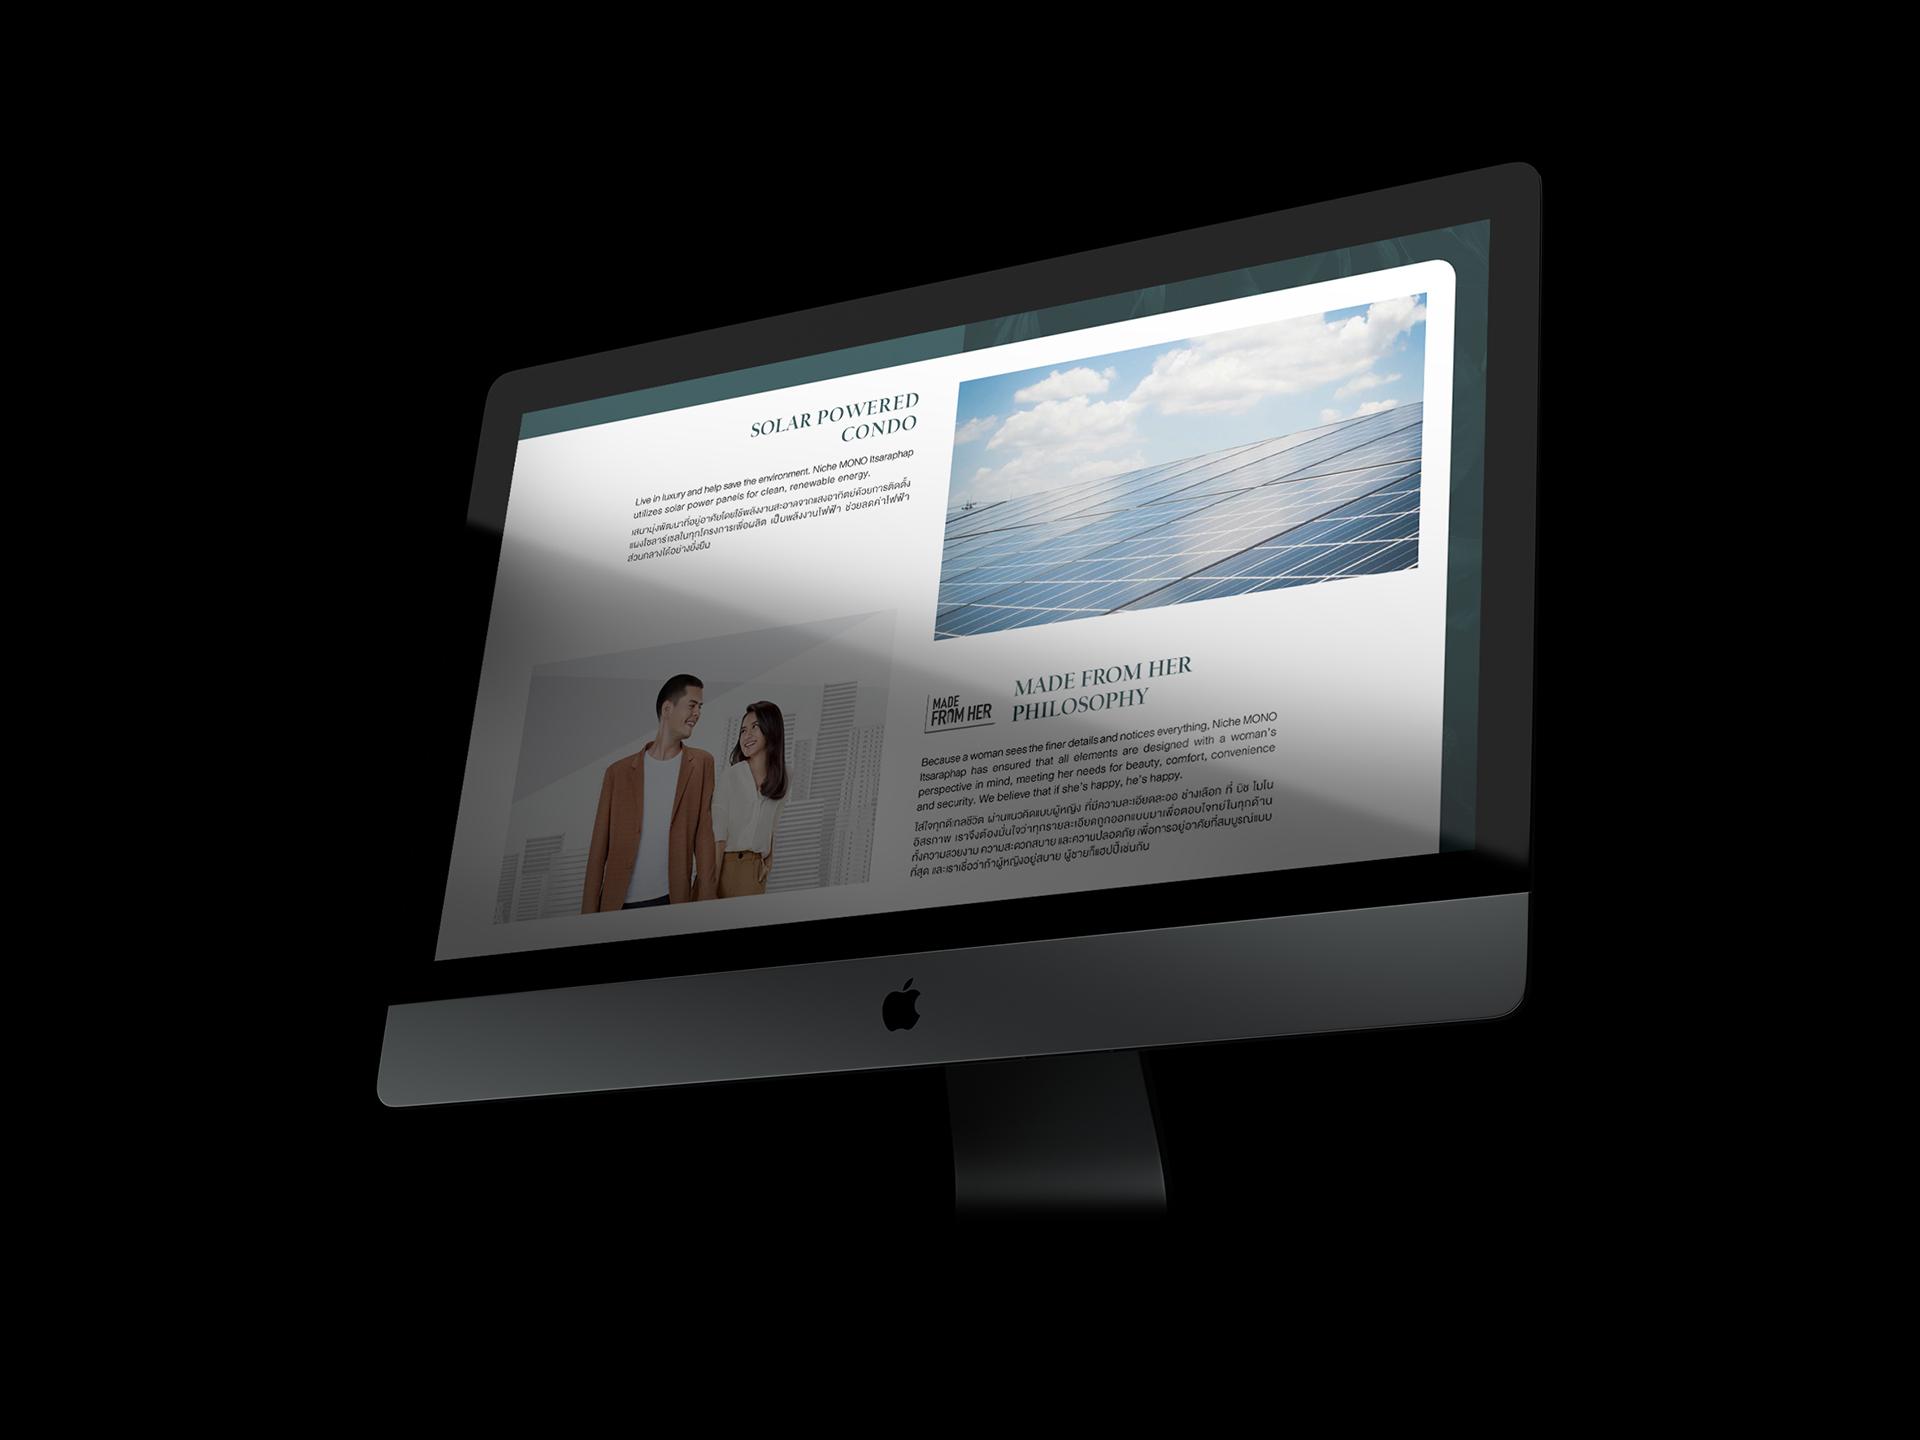 Niche Mono Issaraphap - conspiracy creative digital agency